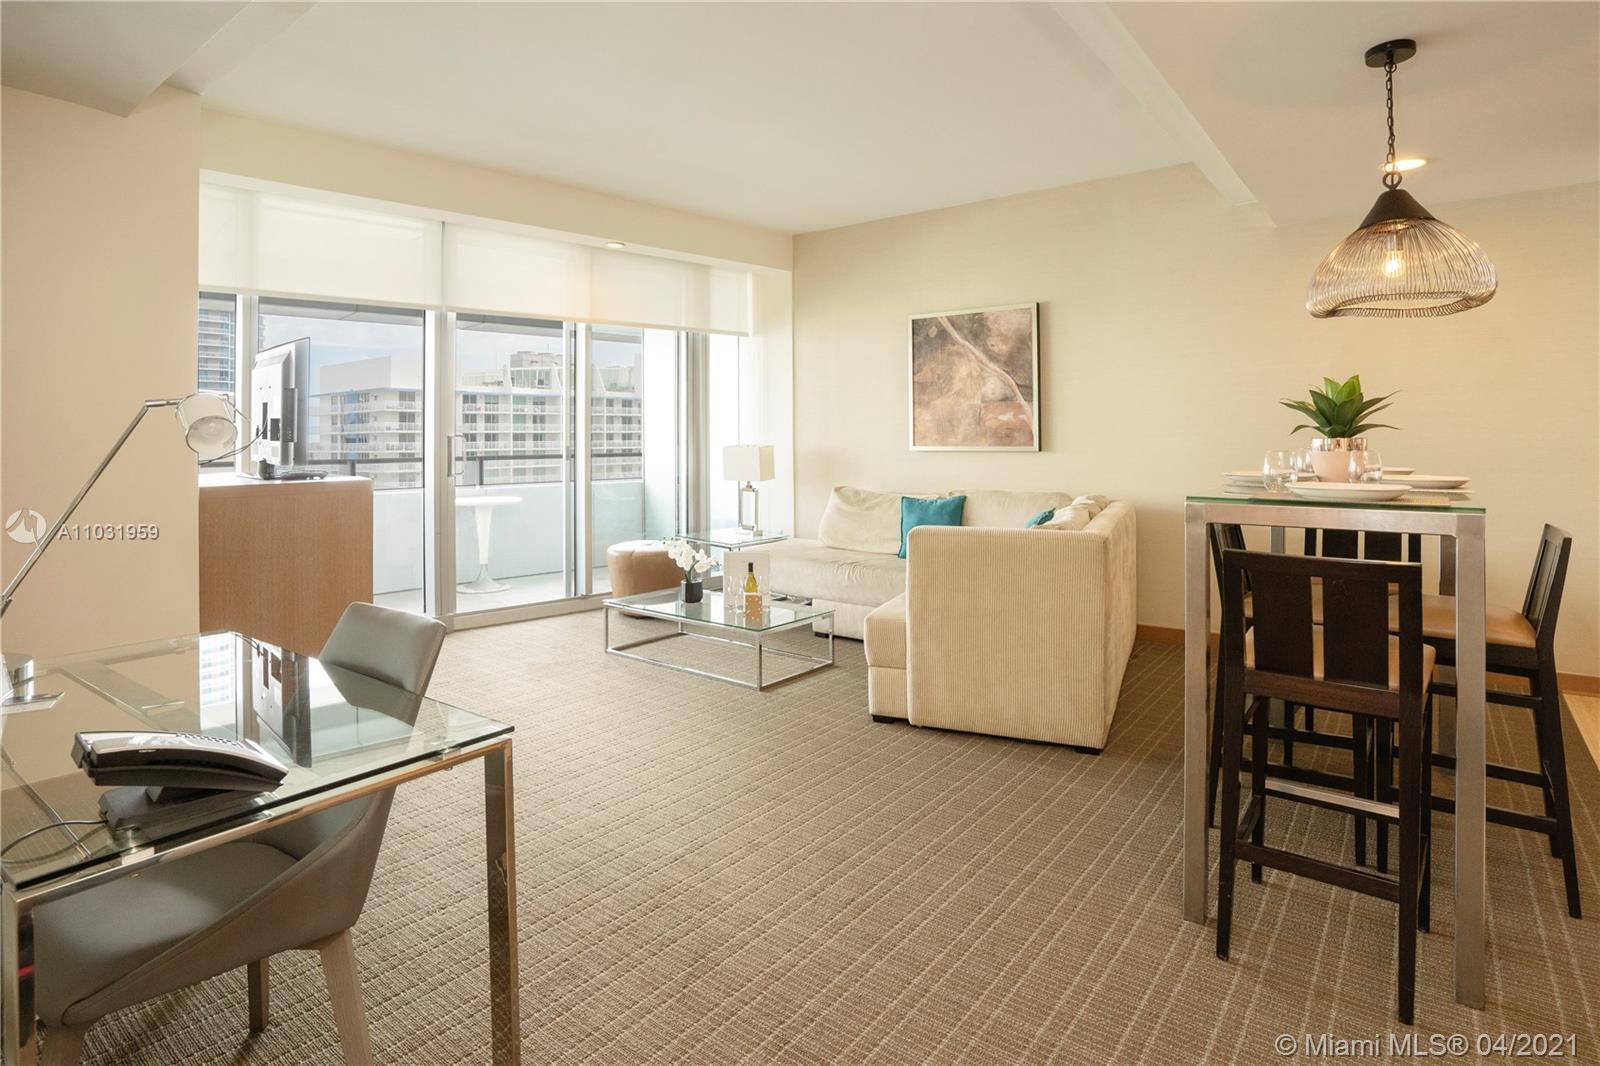 Conrad Miami Residence 1 Bedroom 1 bath breathtaking views of Brickell Skyline and of The Bay Furni